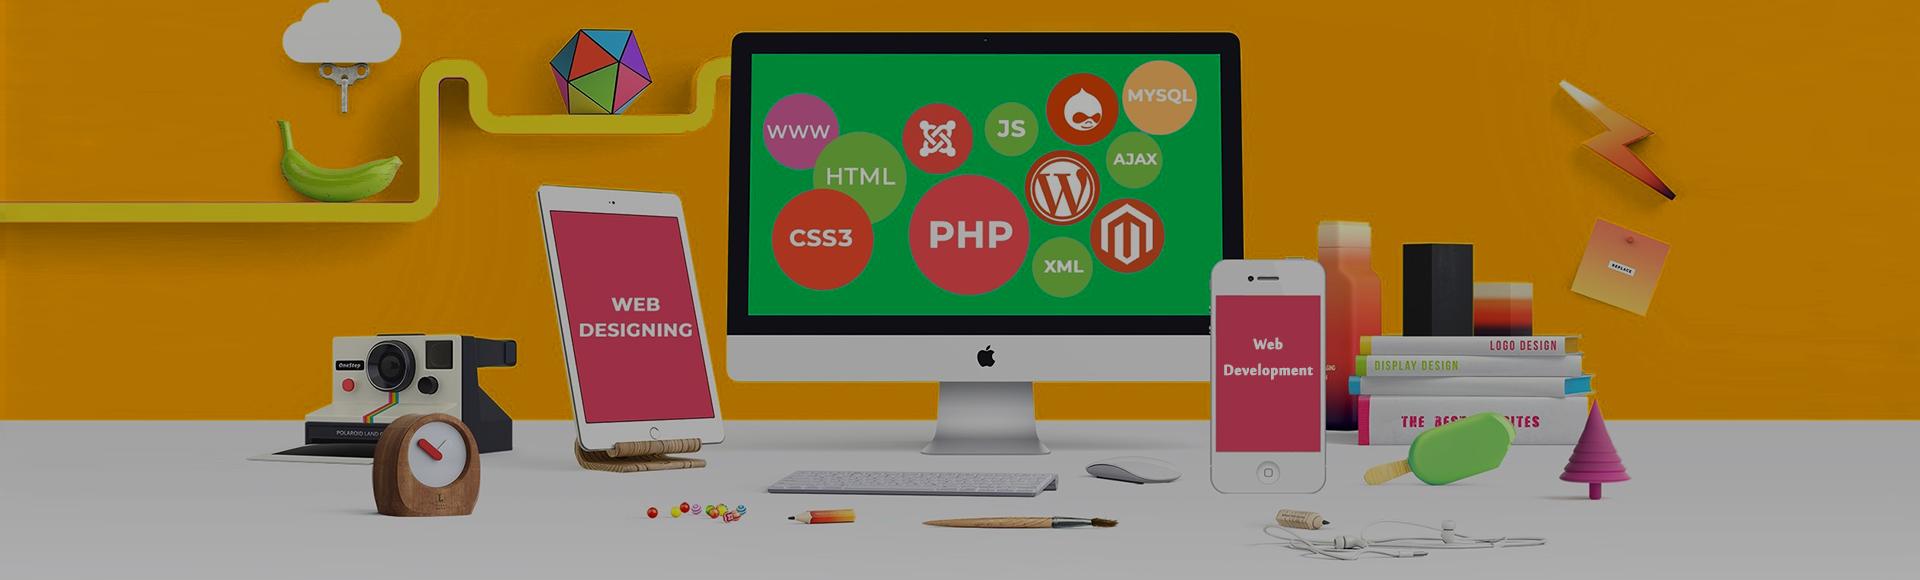 Website Designing and Development, SEO, SMO, CRM Company Karol Bagh